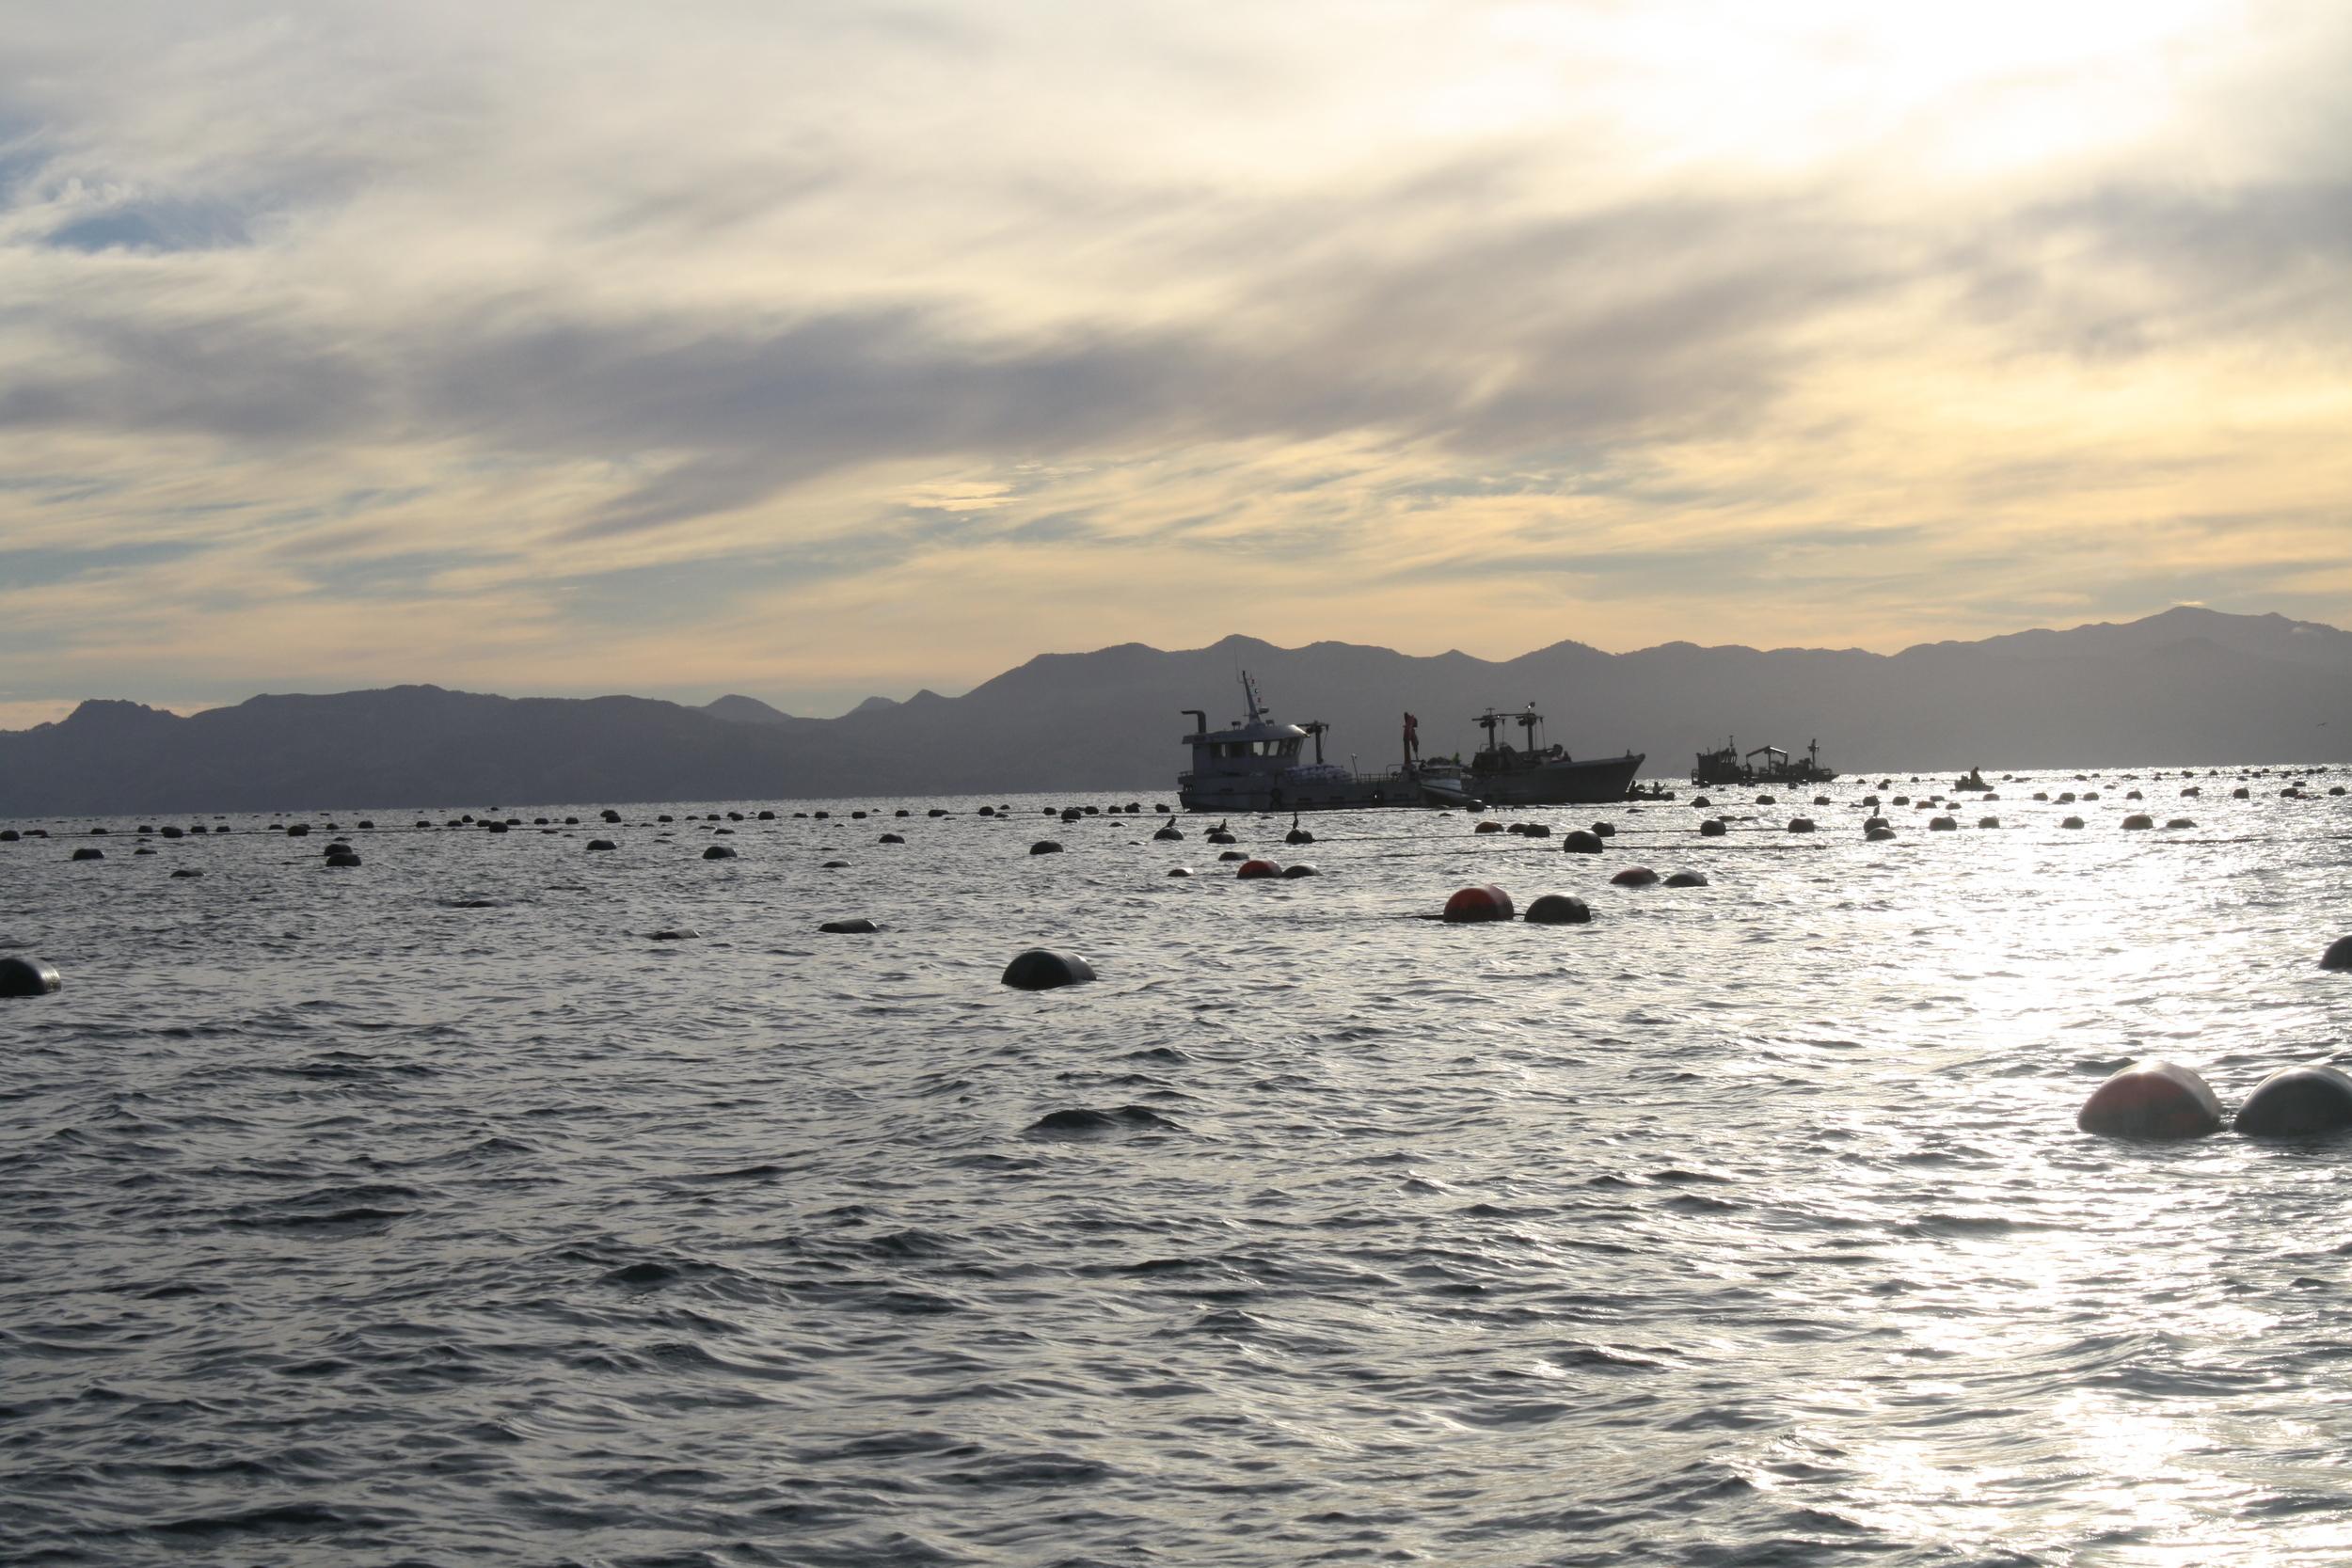 Mussel farming in the Hauraki Gulf